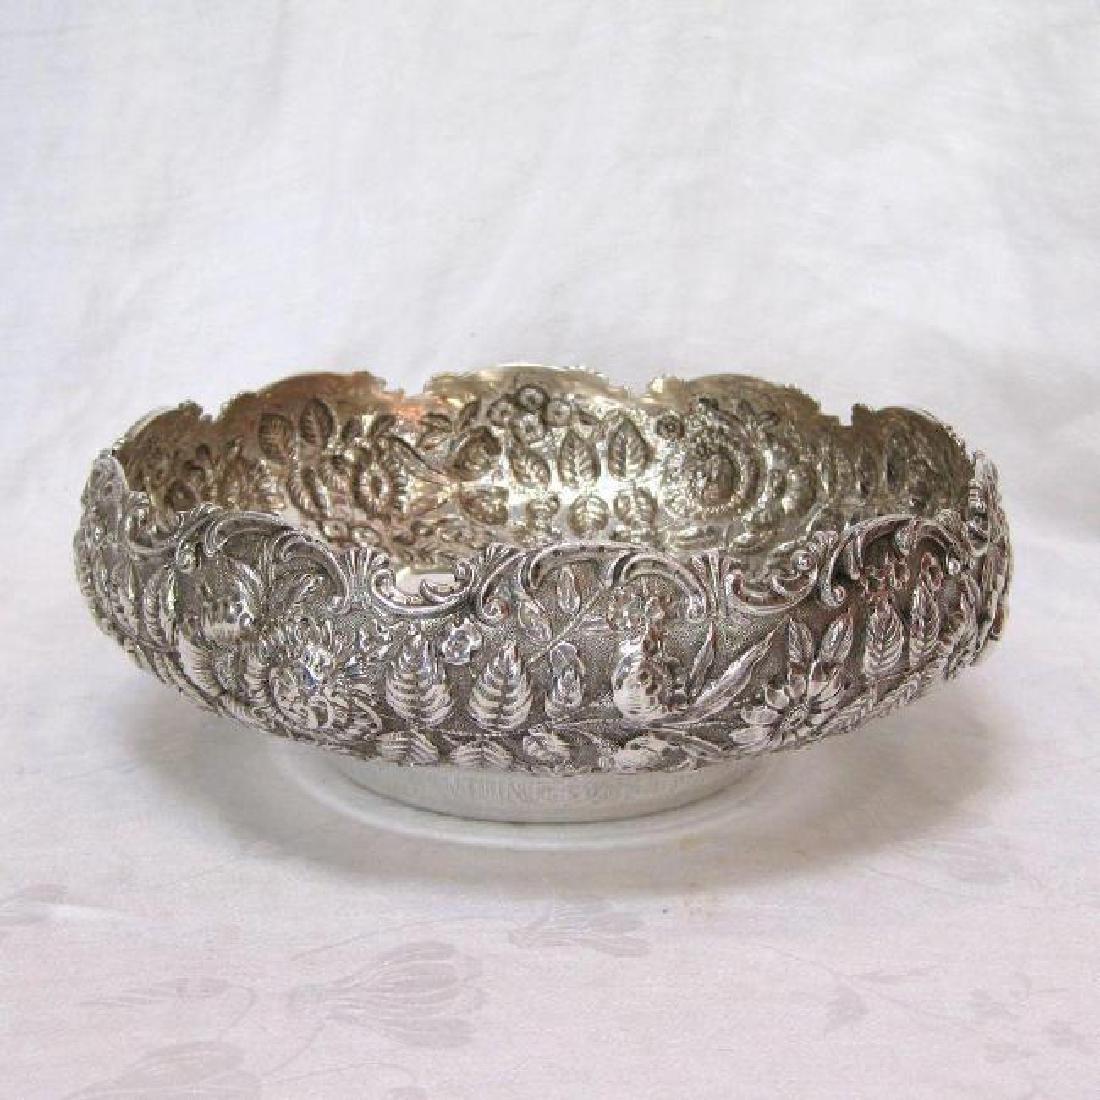 Antique Kirk & Son Sterling Silver Floral Repousse Bowl